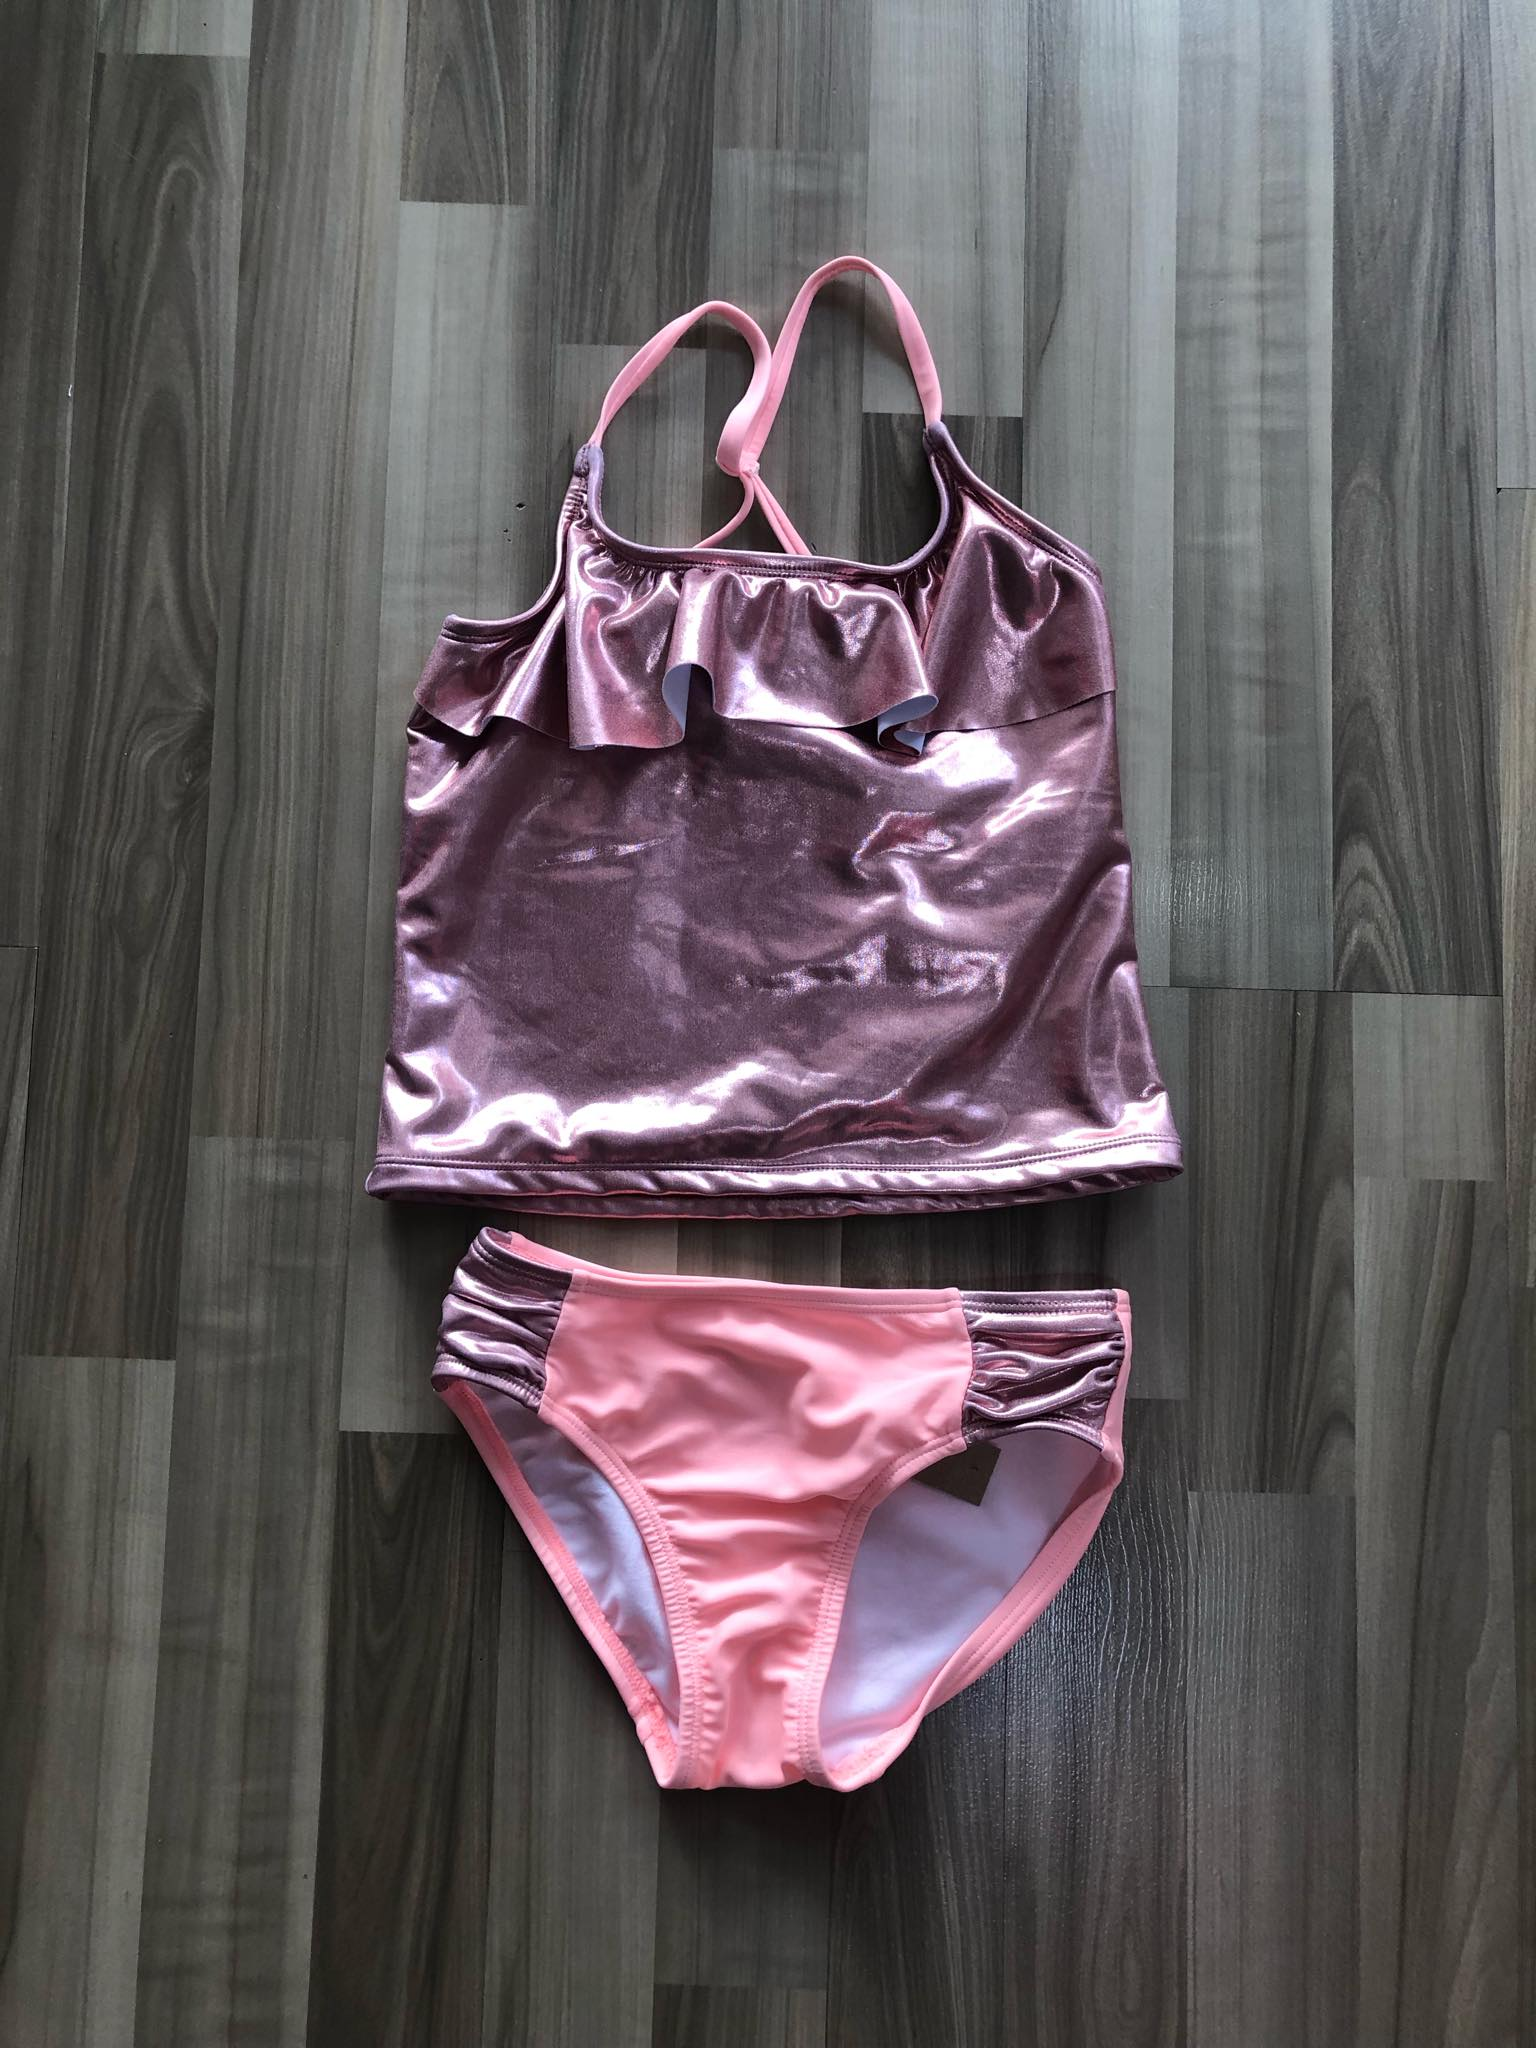 BG-Đồ bơi 2 mảnh hồng kim tuyến